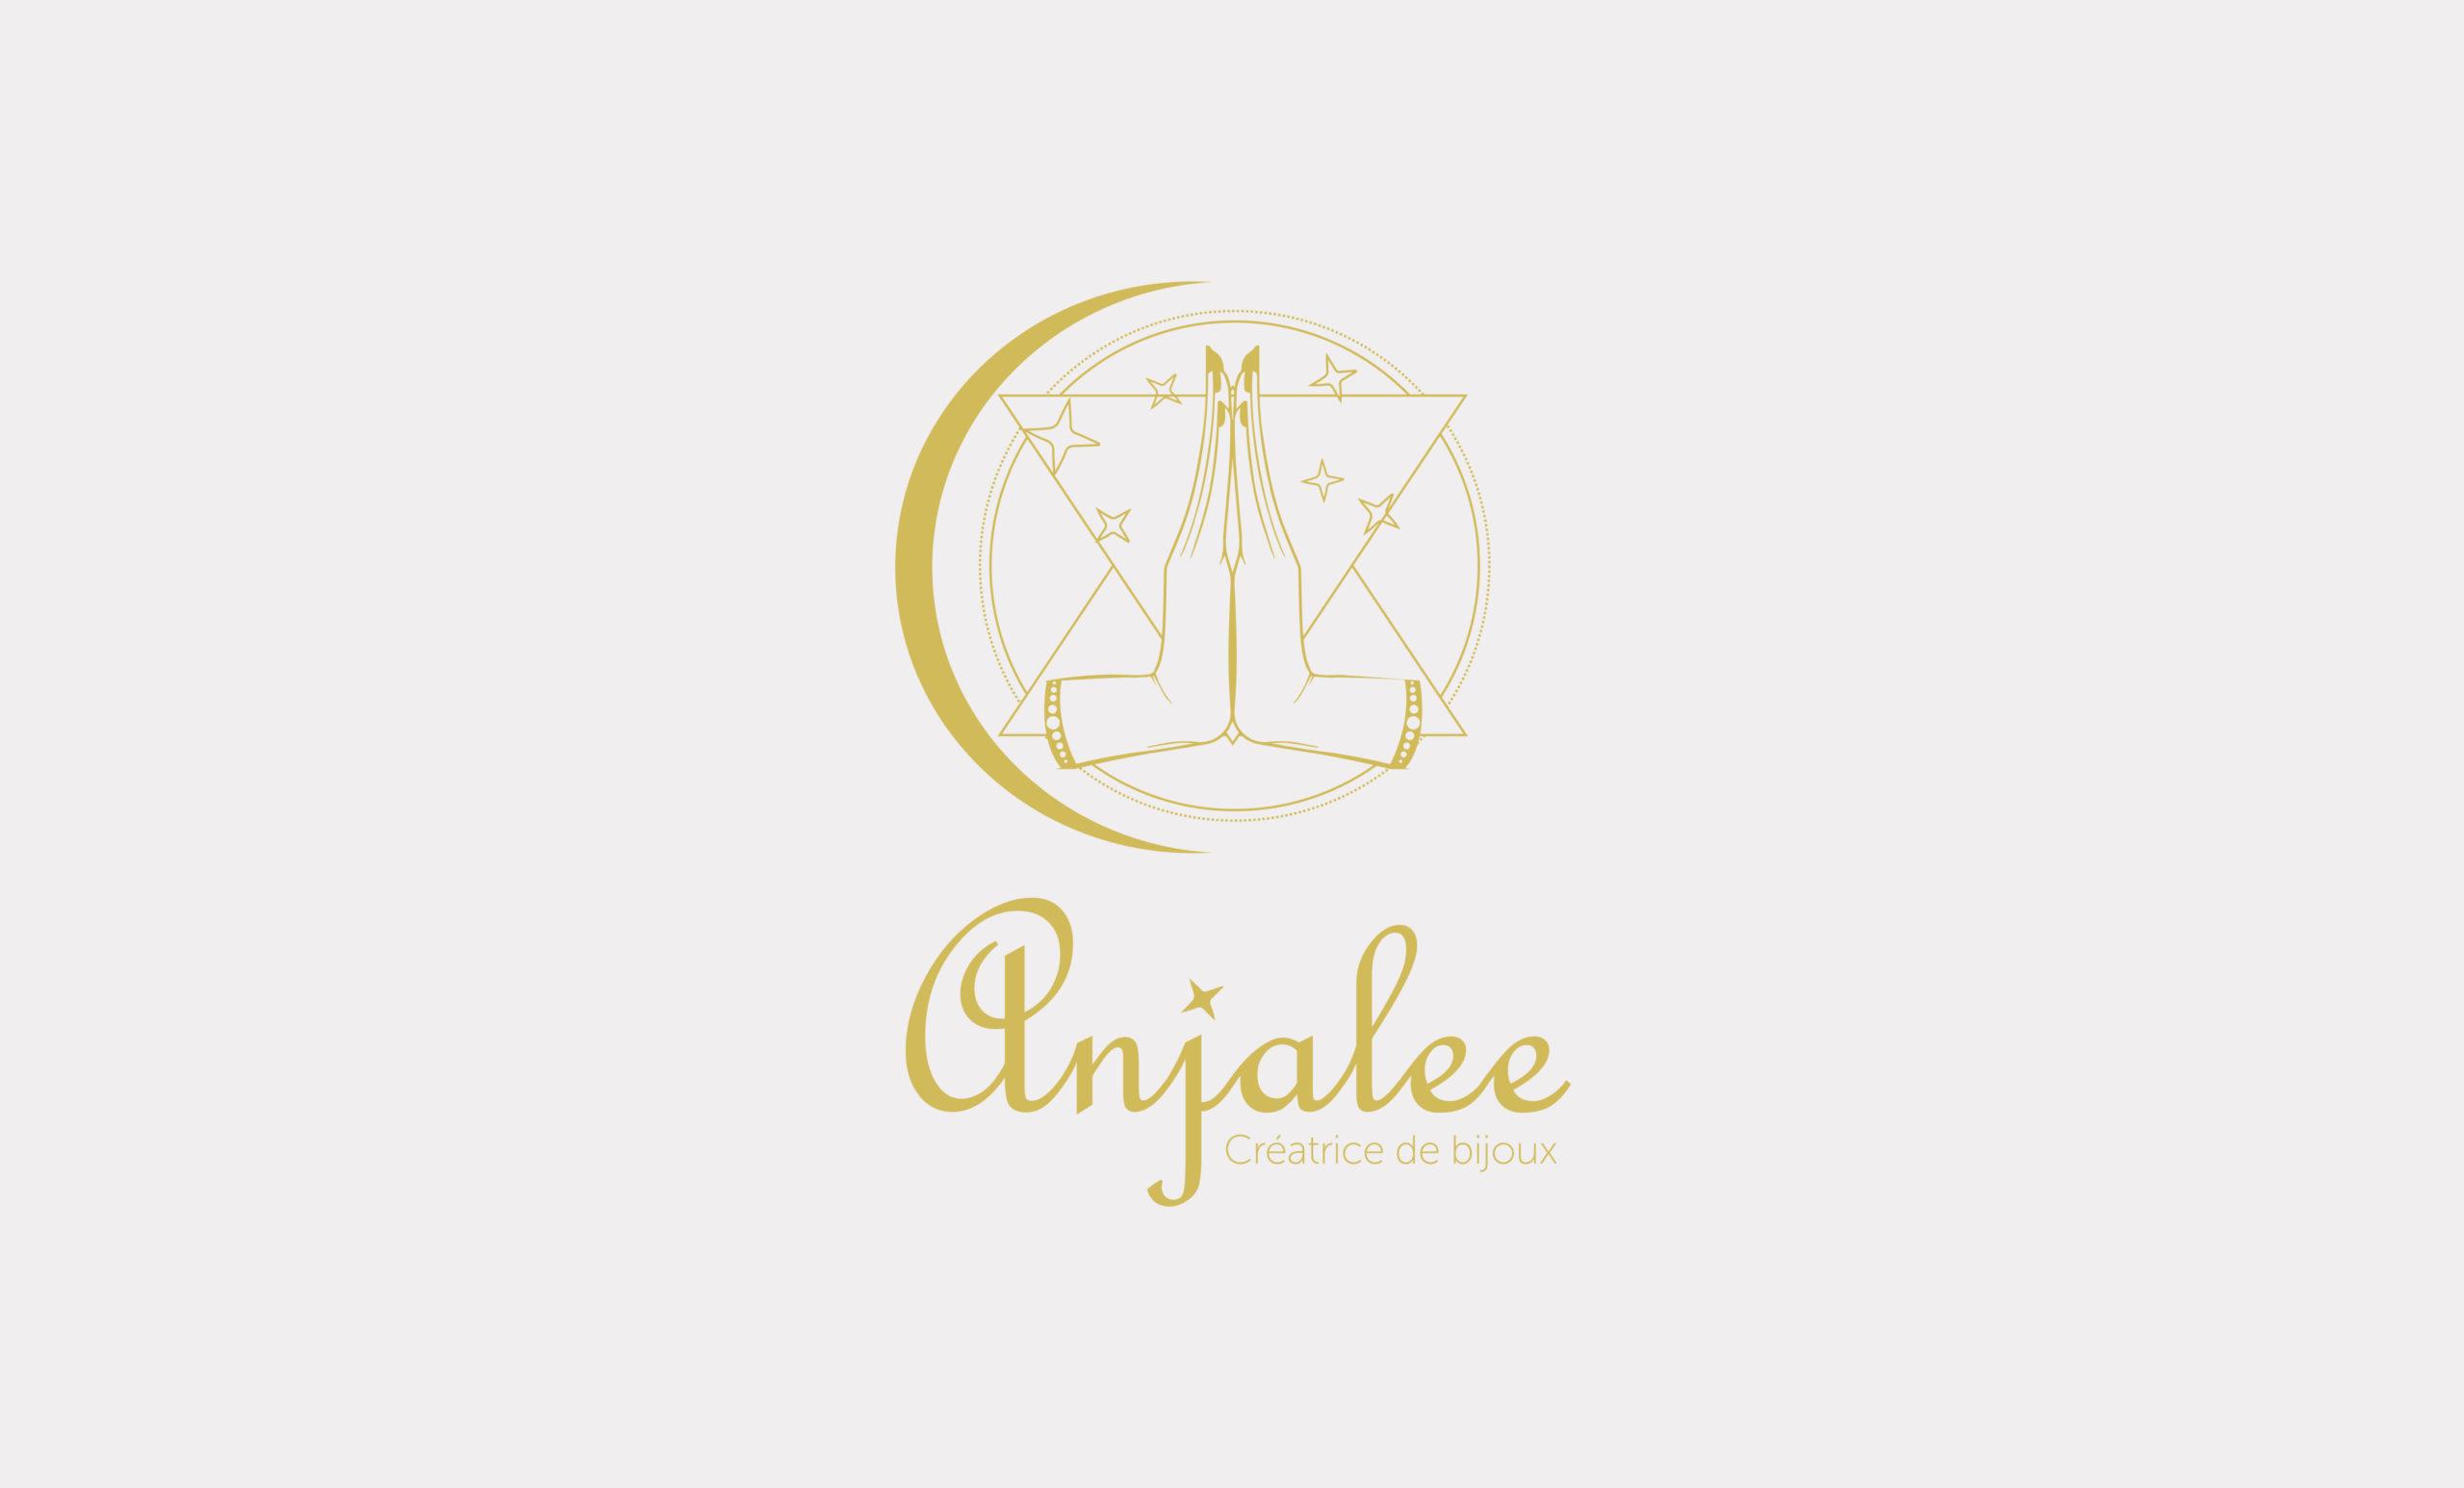 logo-creatrice-de-bijoux